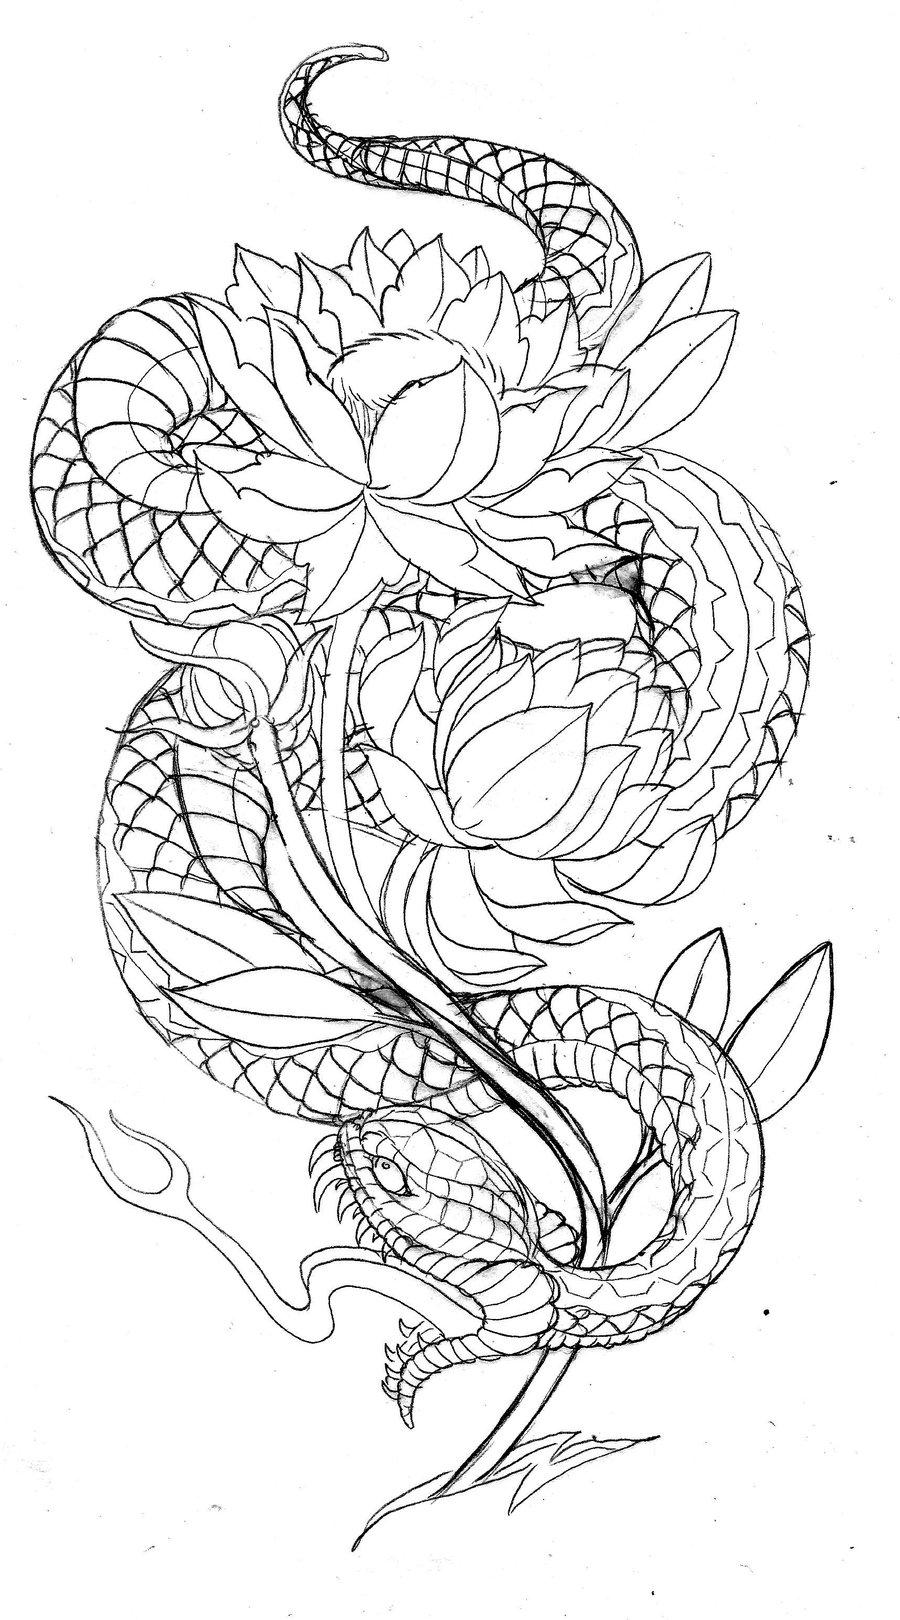 Tatouage Japanese-style-snake-with-lotus-tattoo-design